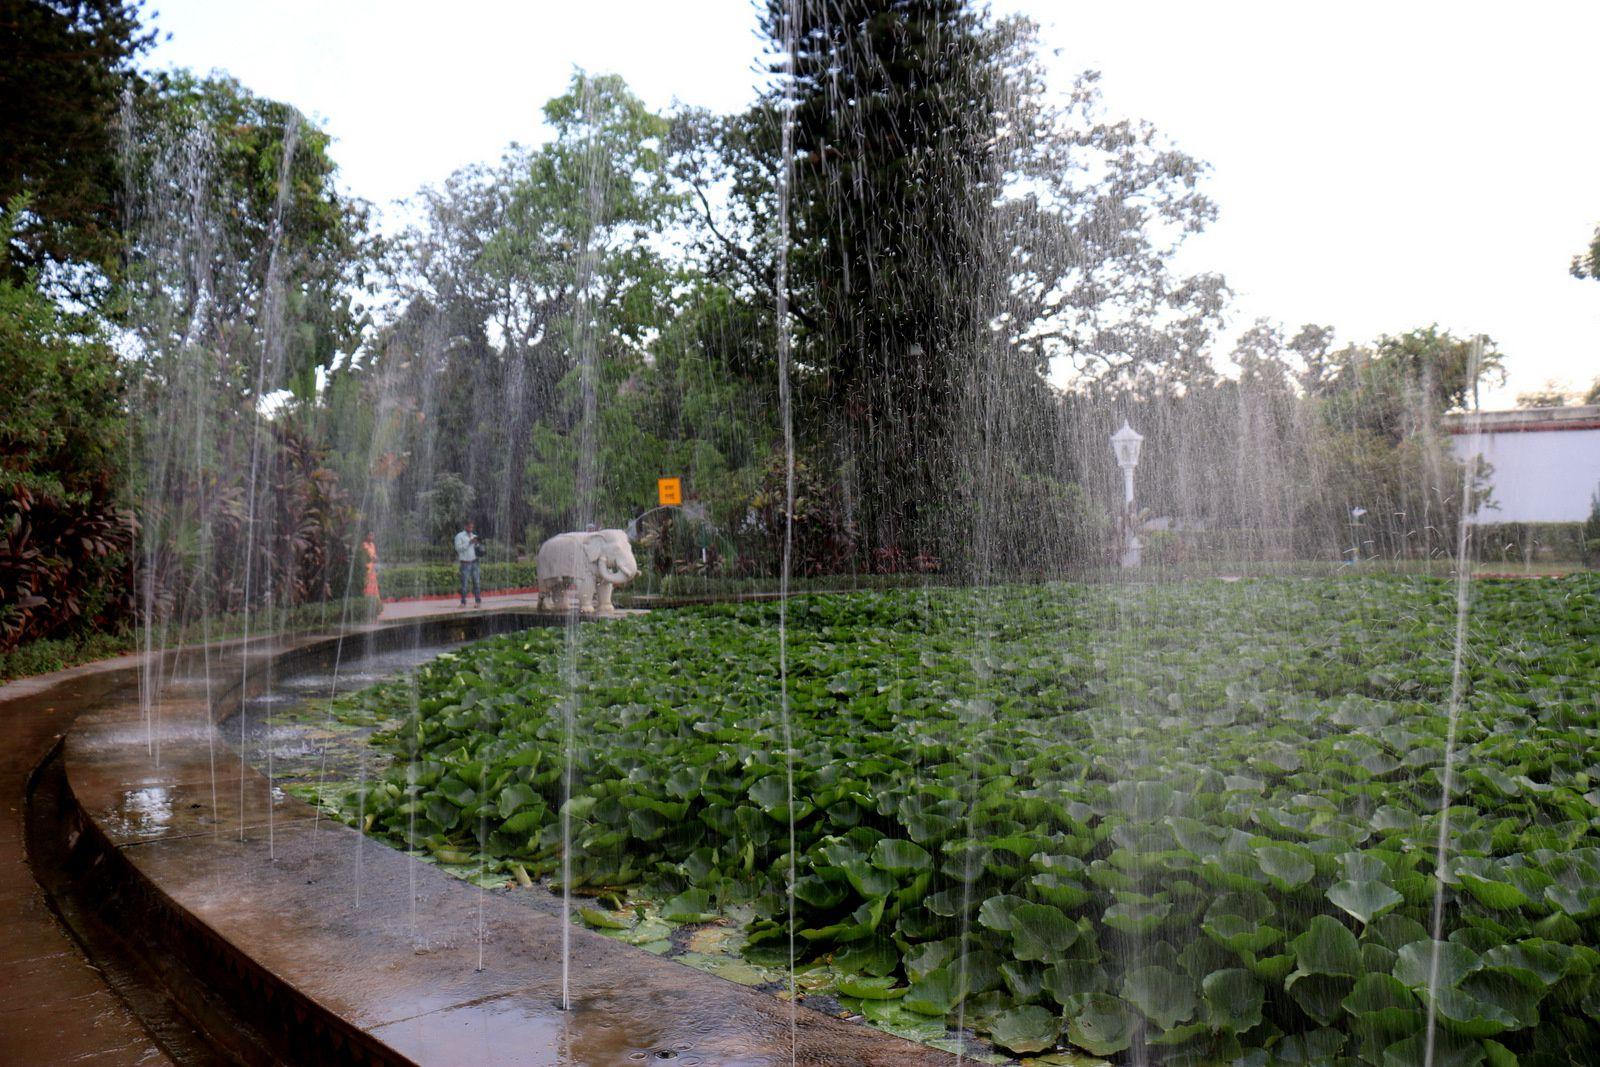 Les bassins du jardin &quot&#x3B;Sahelion Ki Bari&quot&#x3B;, Udaipur, Inde